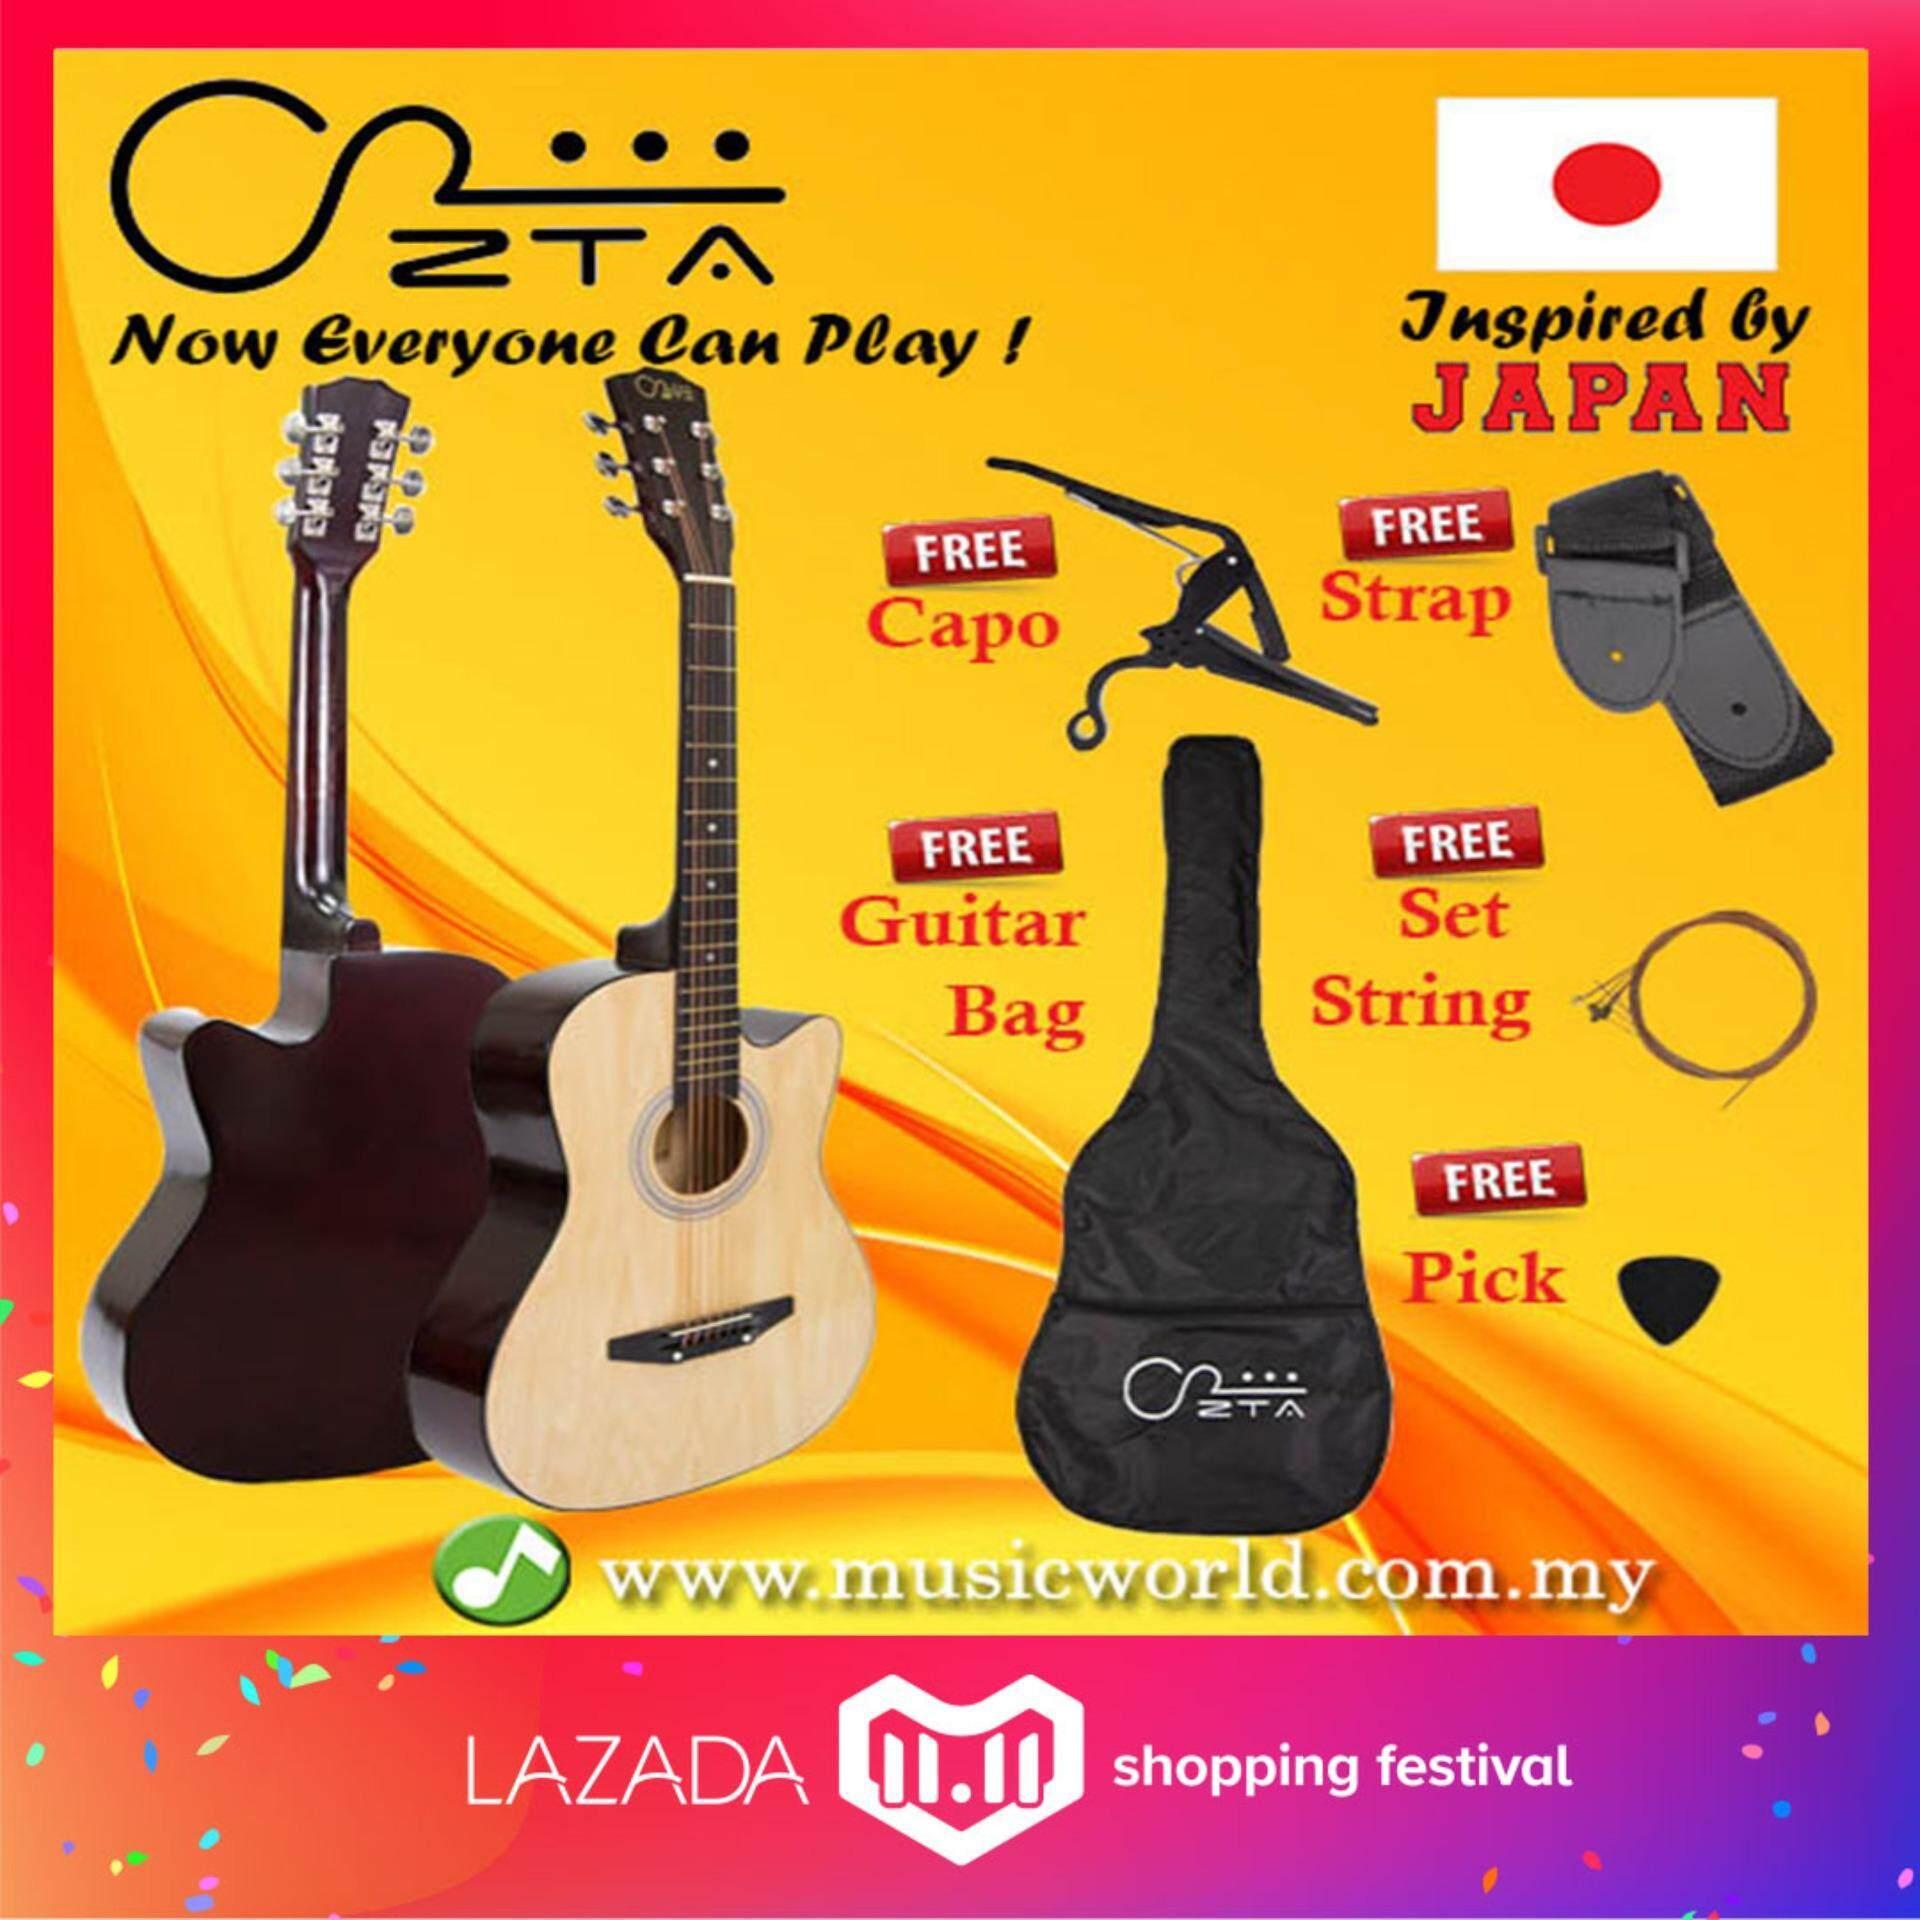 Guitars Musical Instruments With Best Price In Malaysia Kramer Focus Guitar Wiring Diagram Zta 38 Inch Acoustic Natural Cutaway Starter Pack Folk Bundle